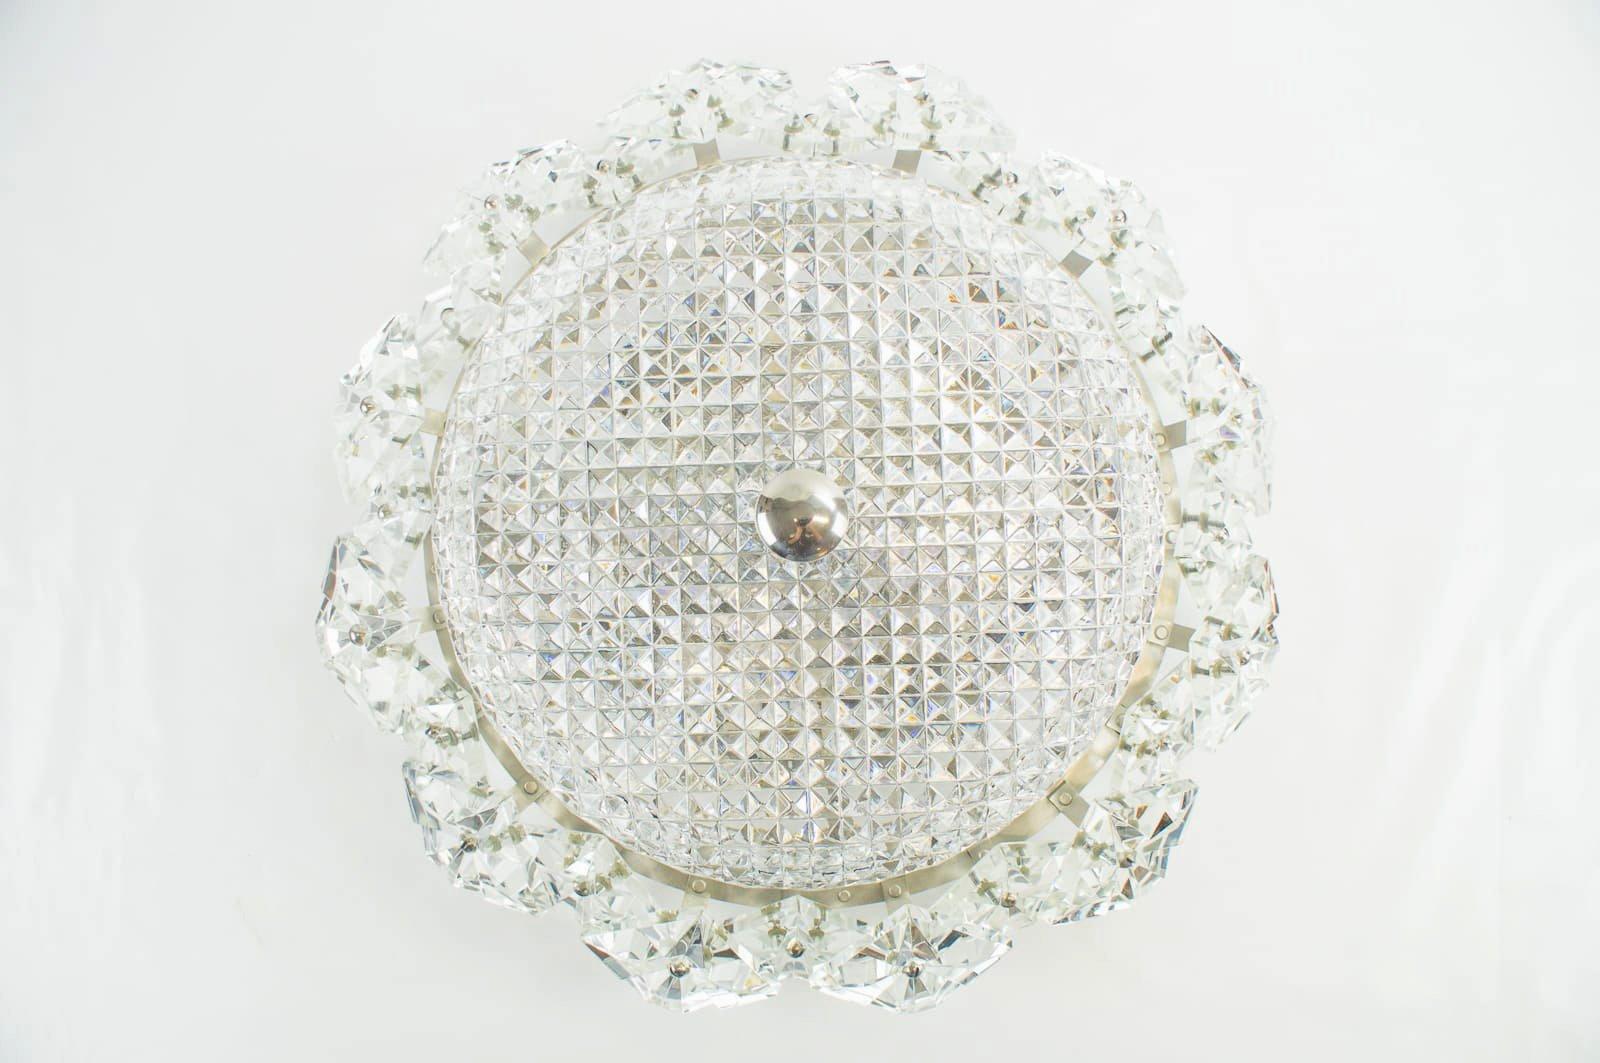 Kristallglas Lampen von Kinkeldey, 1960er, 2er Set